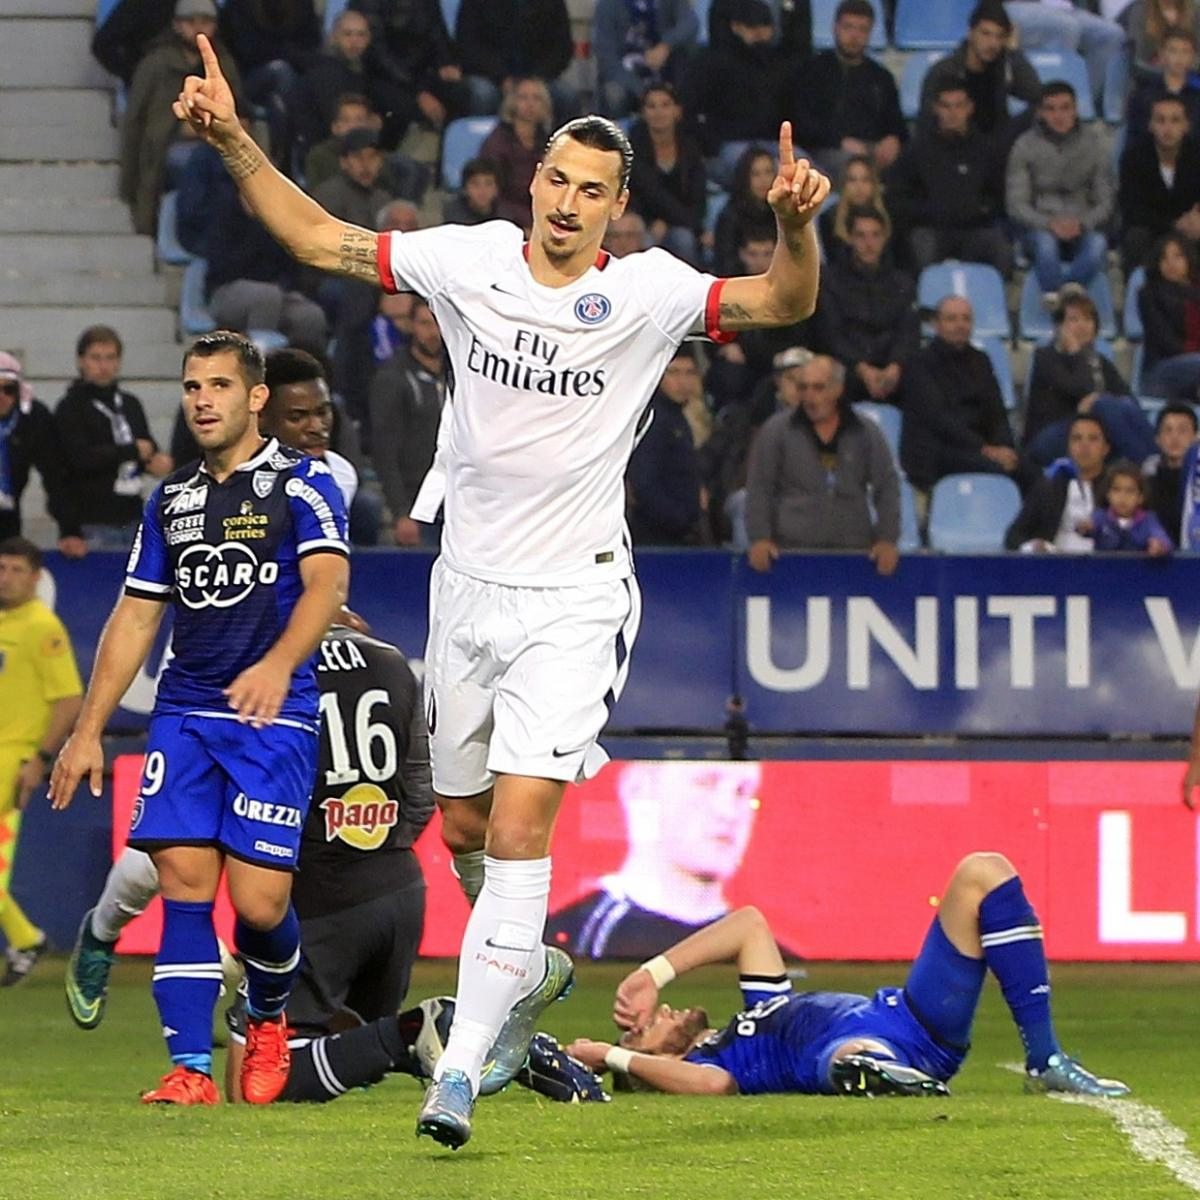 Bastia 0 3 Psg Match Report: Zlatan Ibrahimovic Leads Insipid PSG Past Bastia Ahead Of